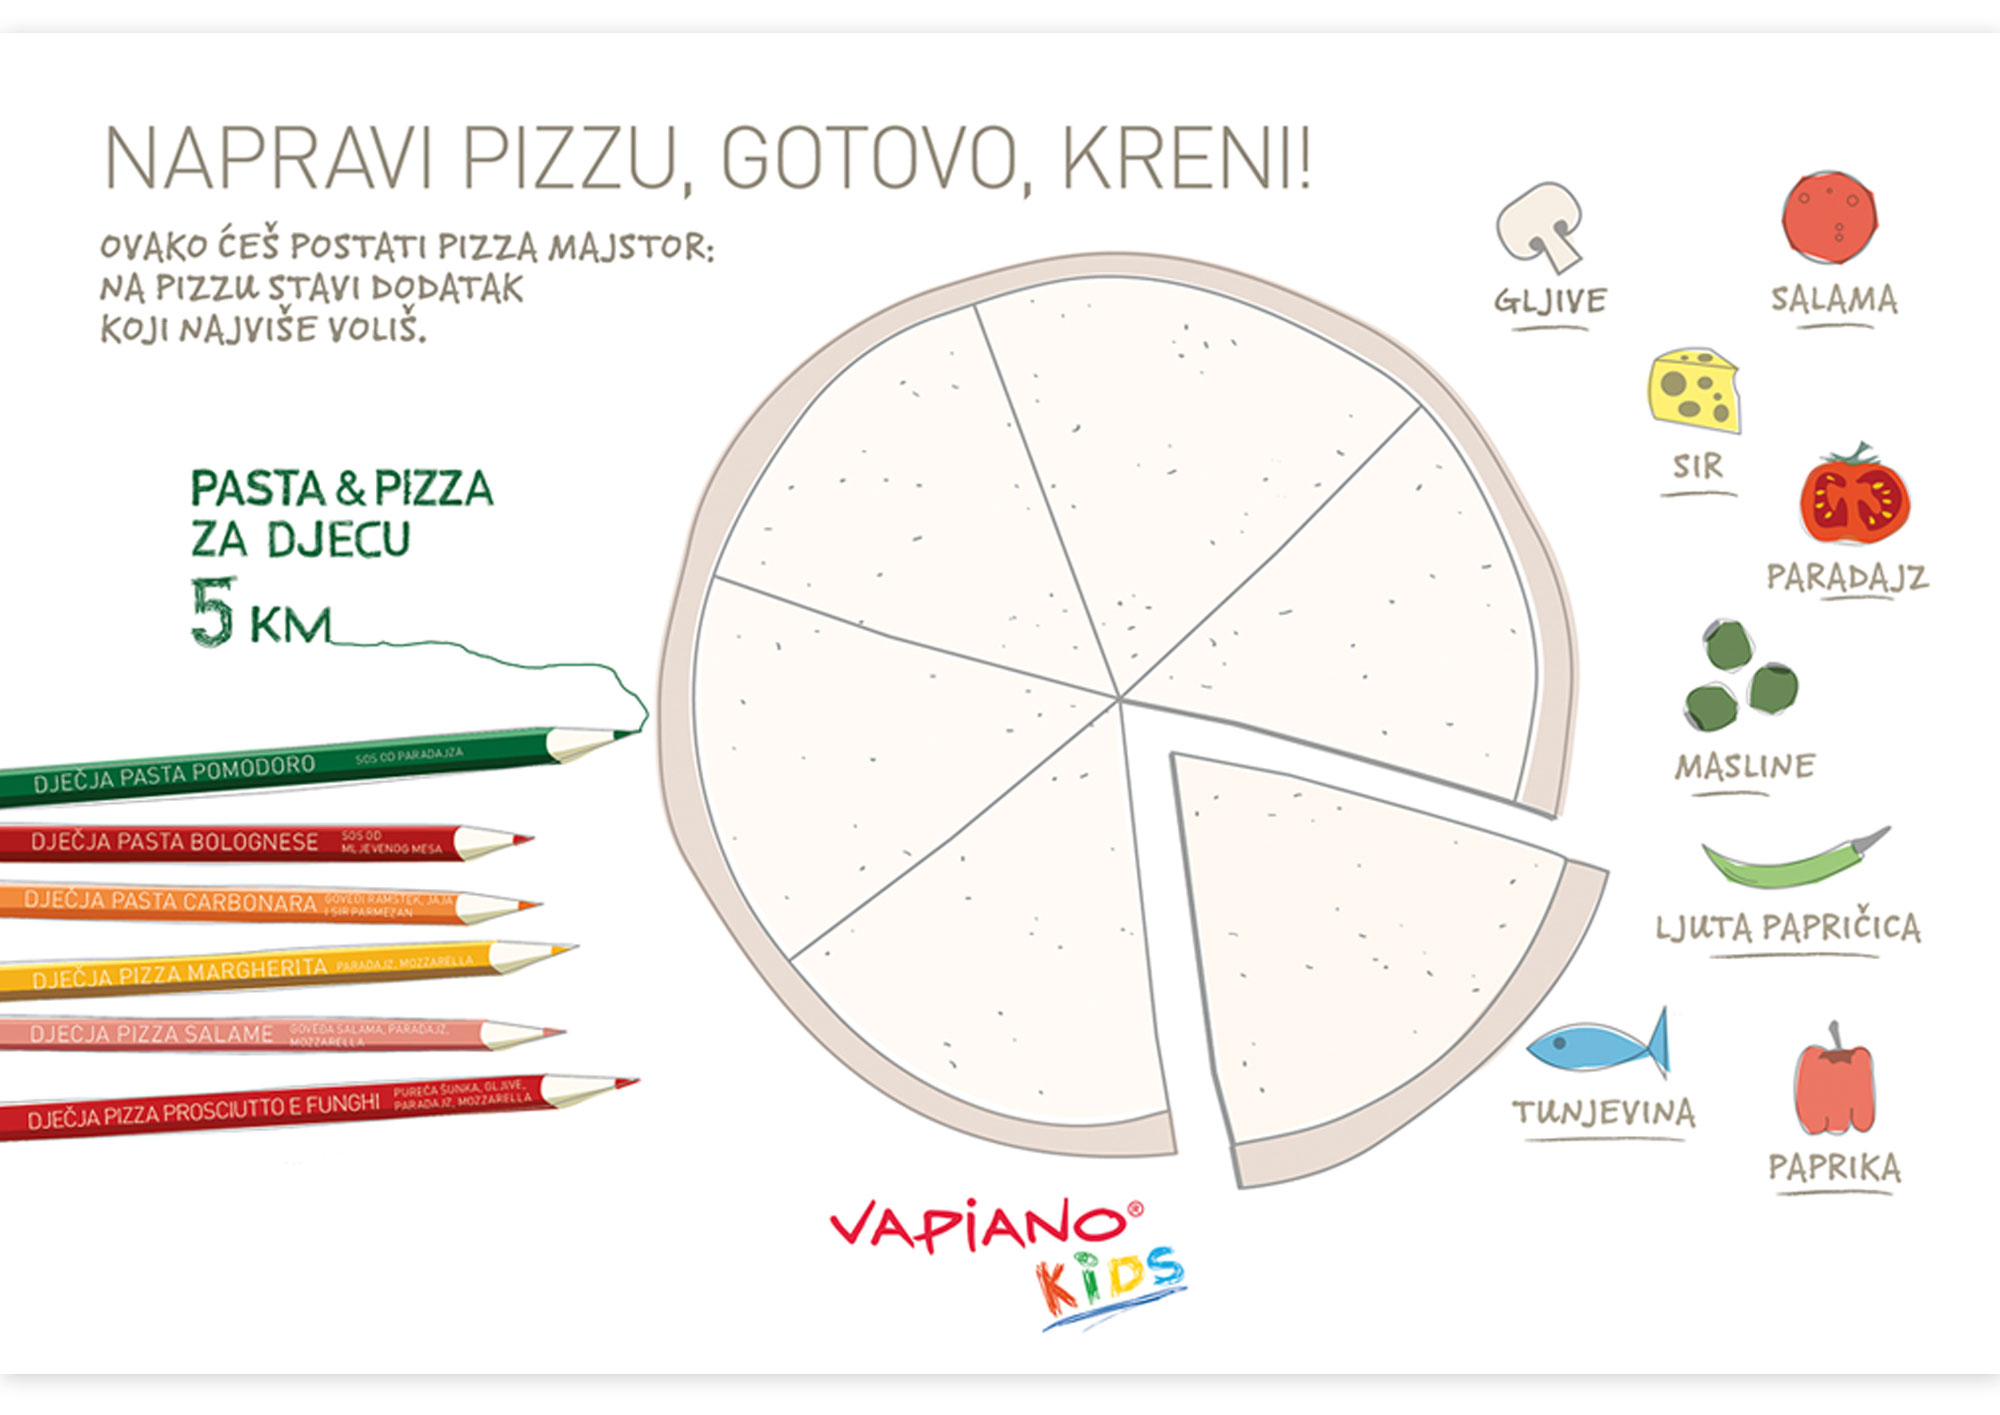 vapiano poster 8